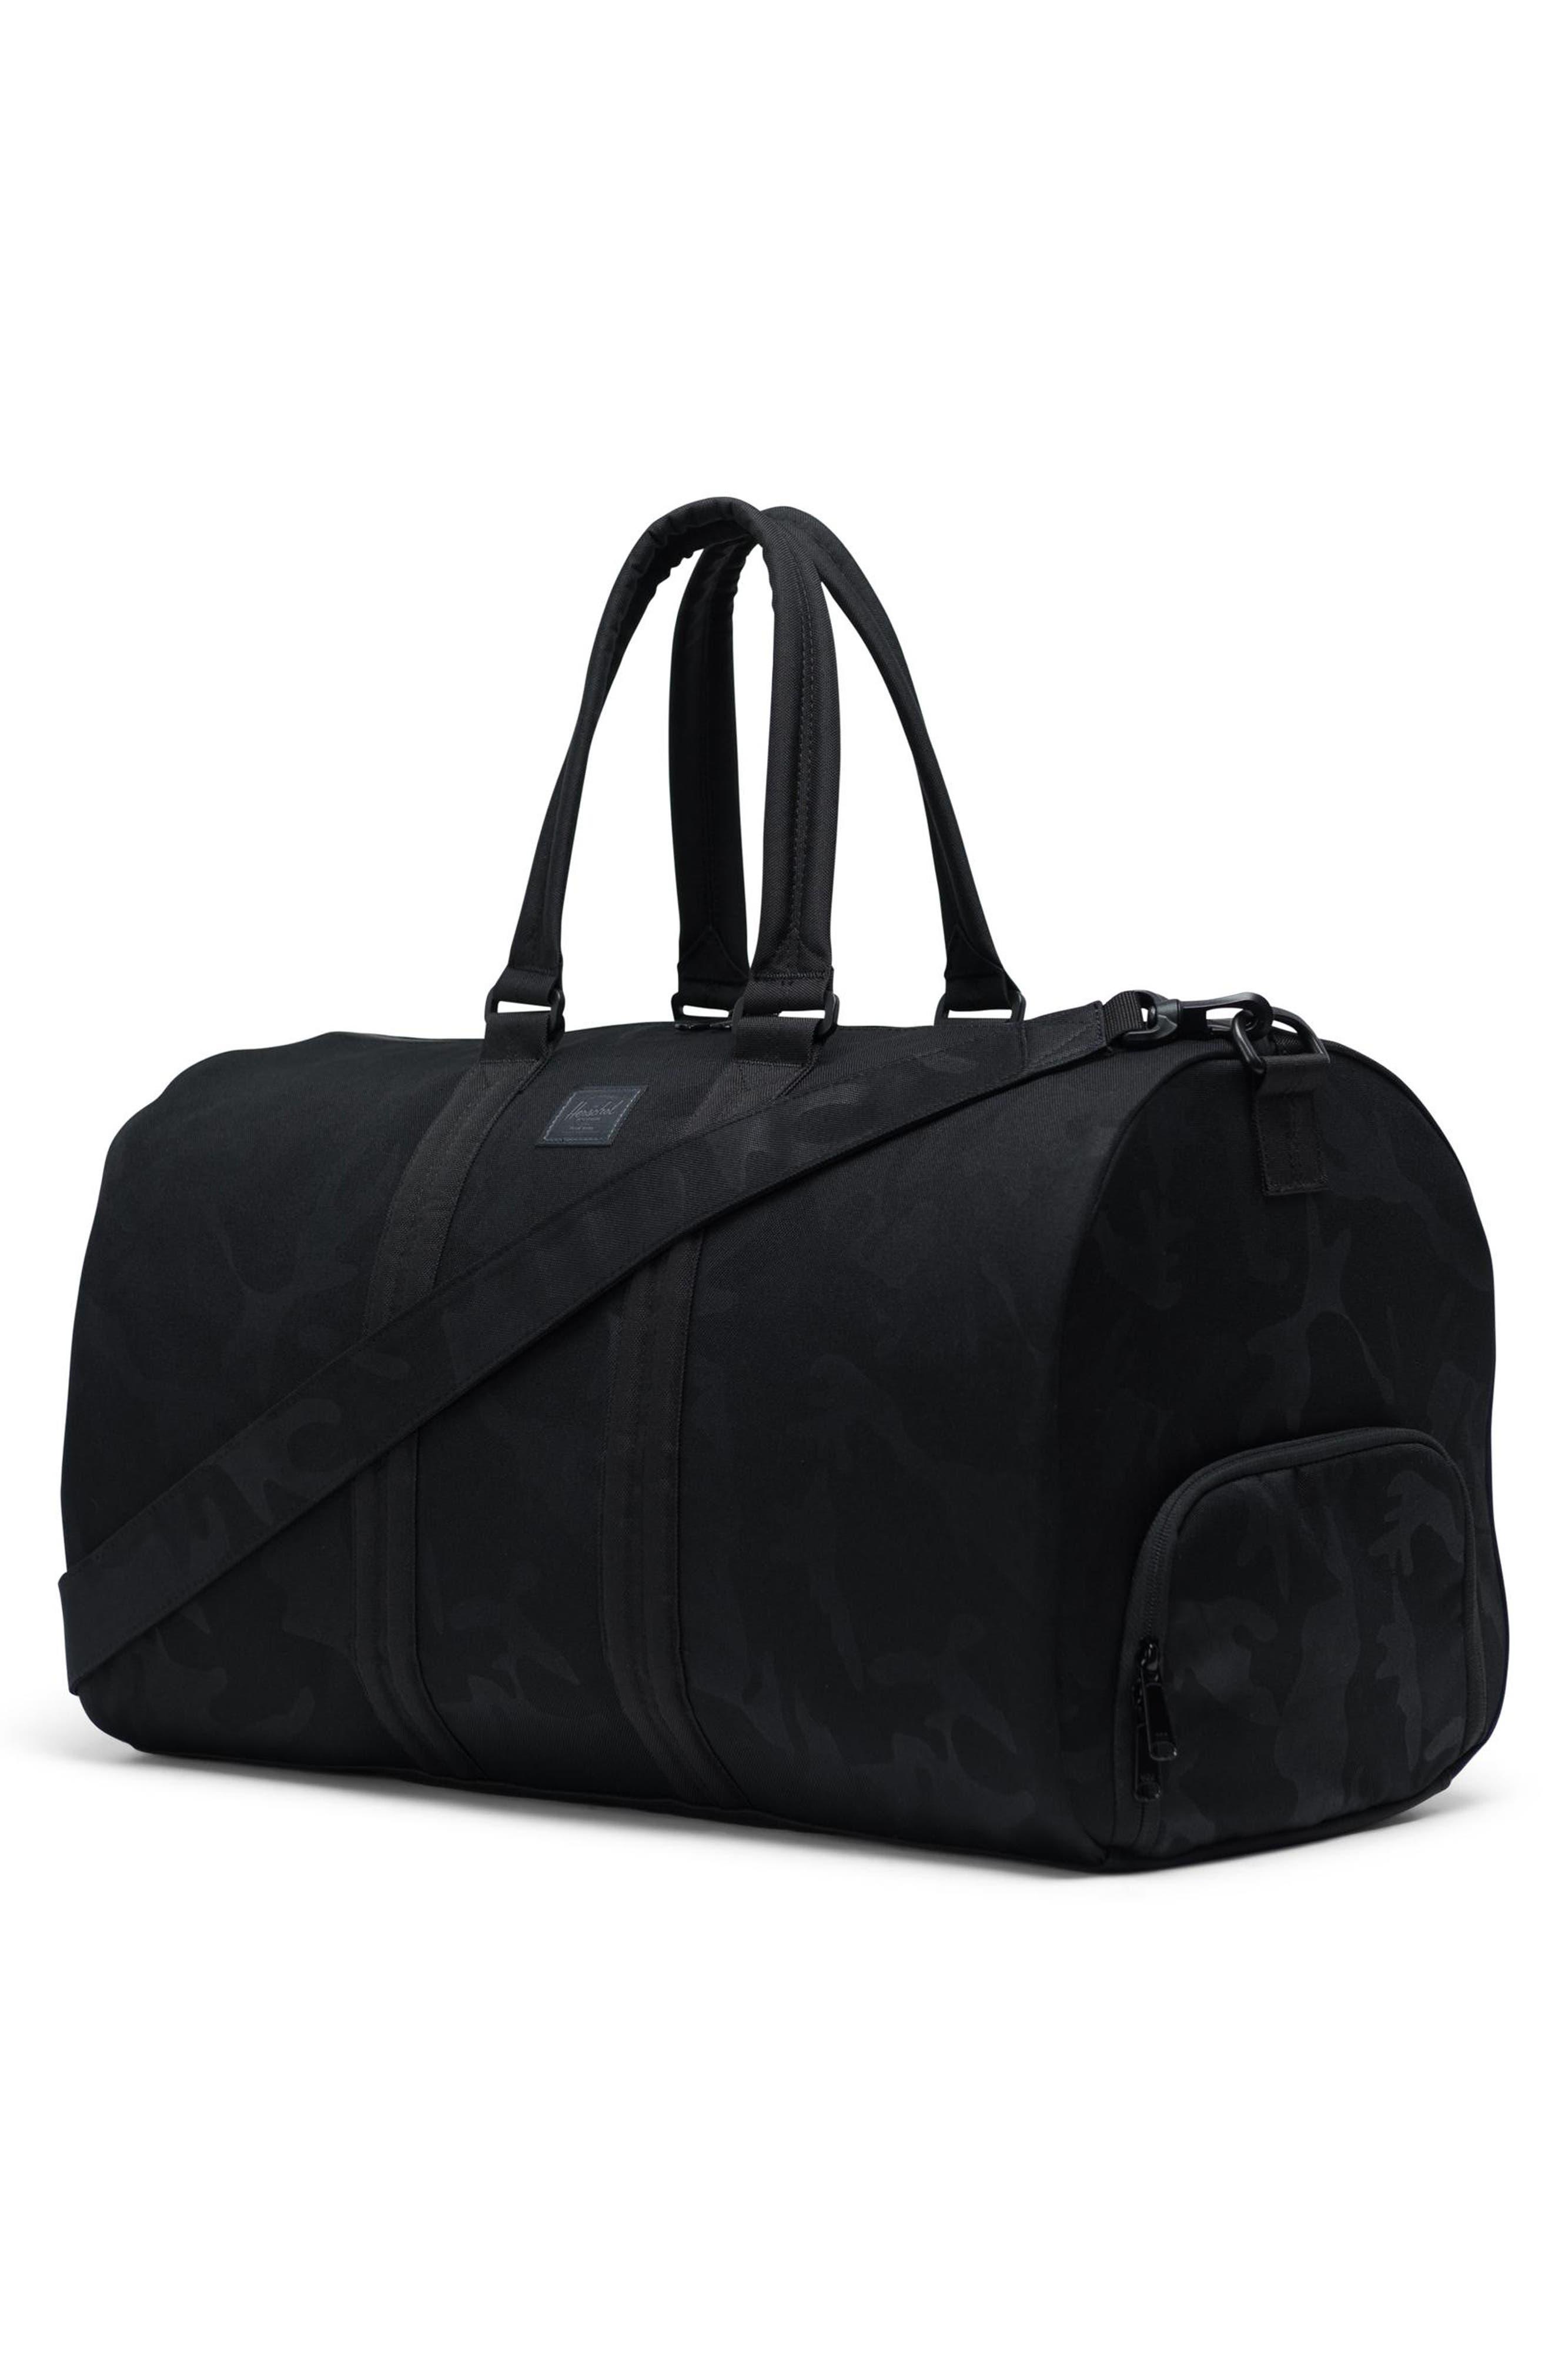 HERSCHEL SUPPLY CO., Duffle Bag, Alternate thumbnail 3, color, BLACK/ TONAL CAMO